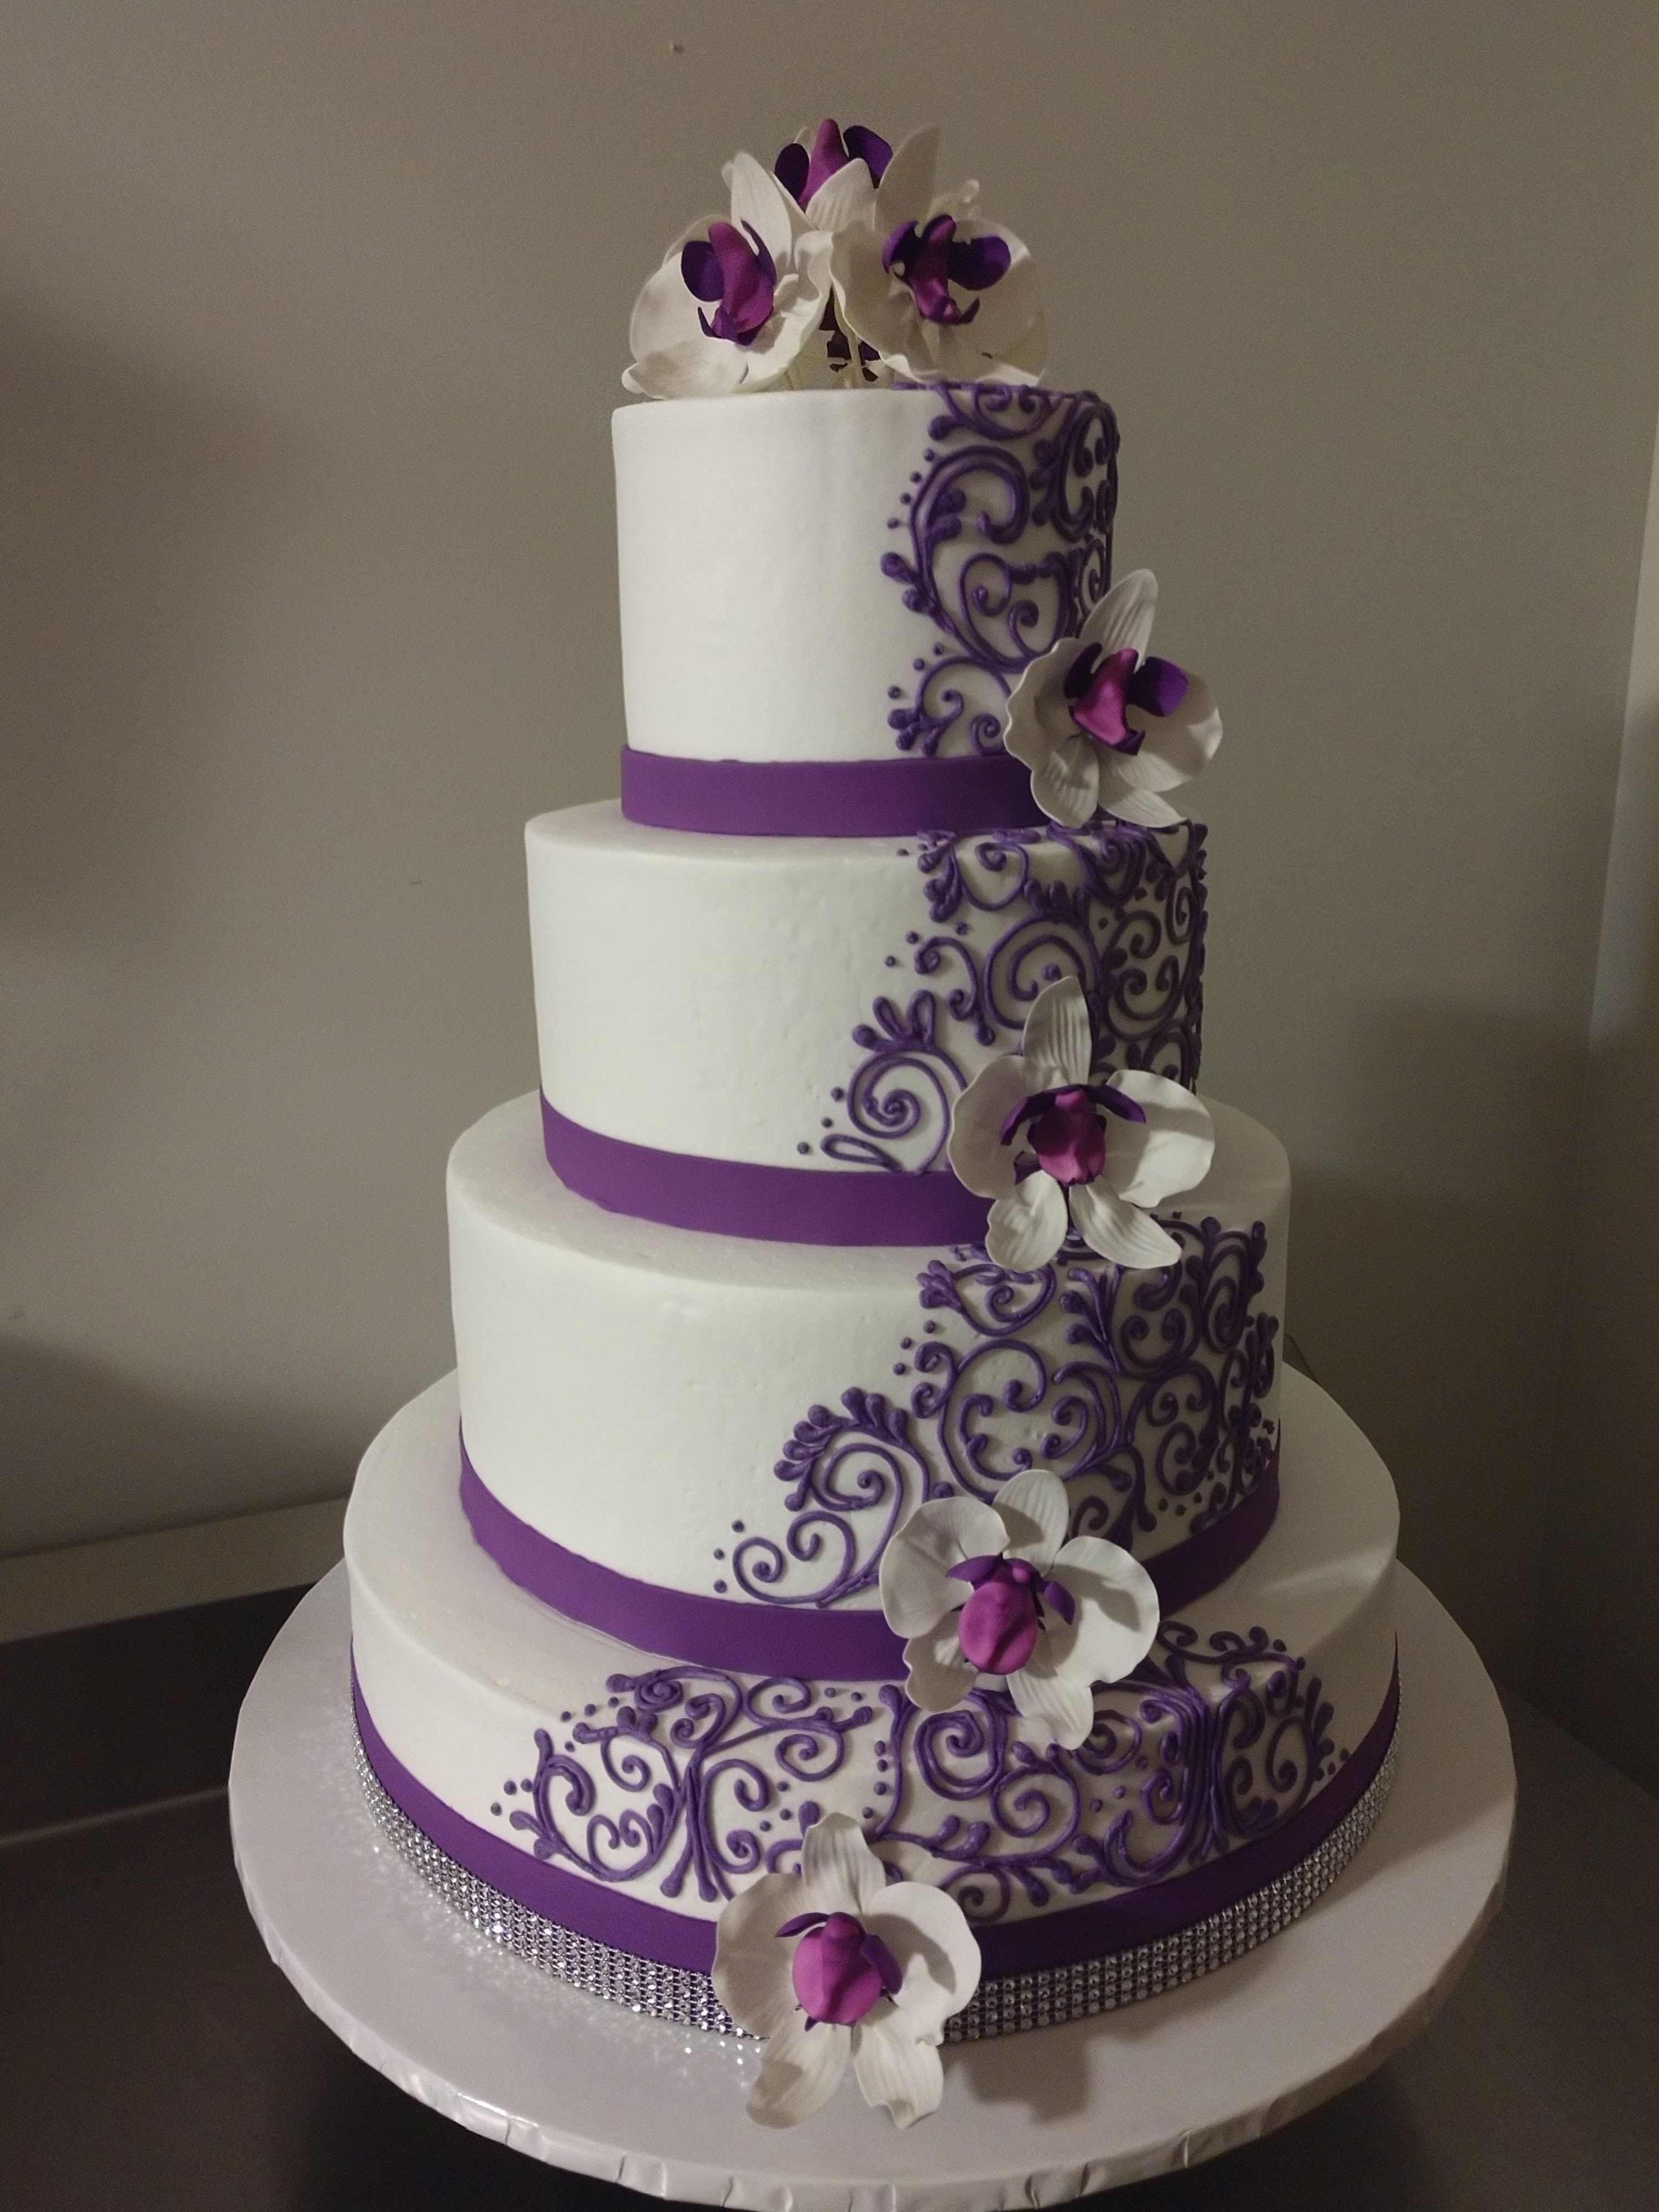 Purple Orchids Scrollwork Wedding Cake, InfoVintageBakery